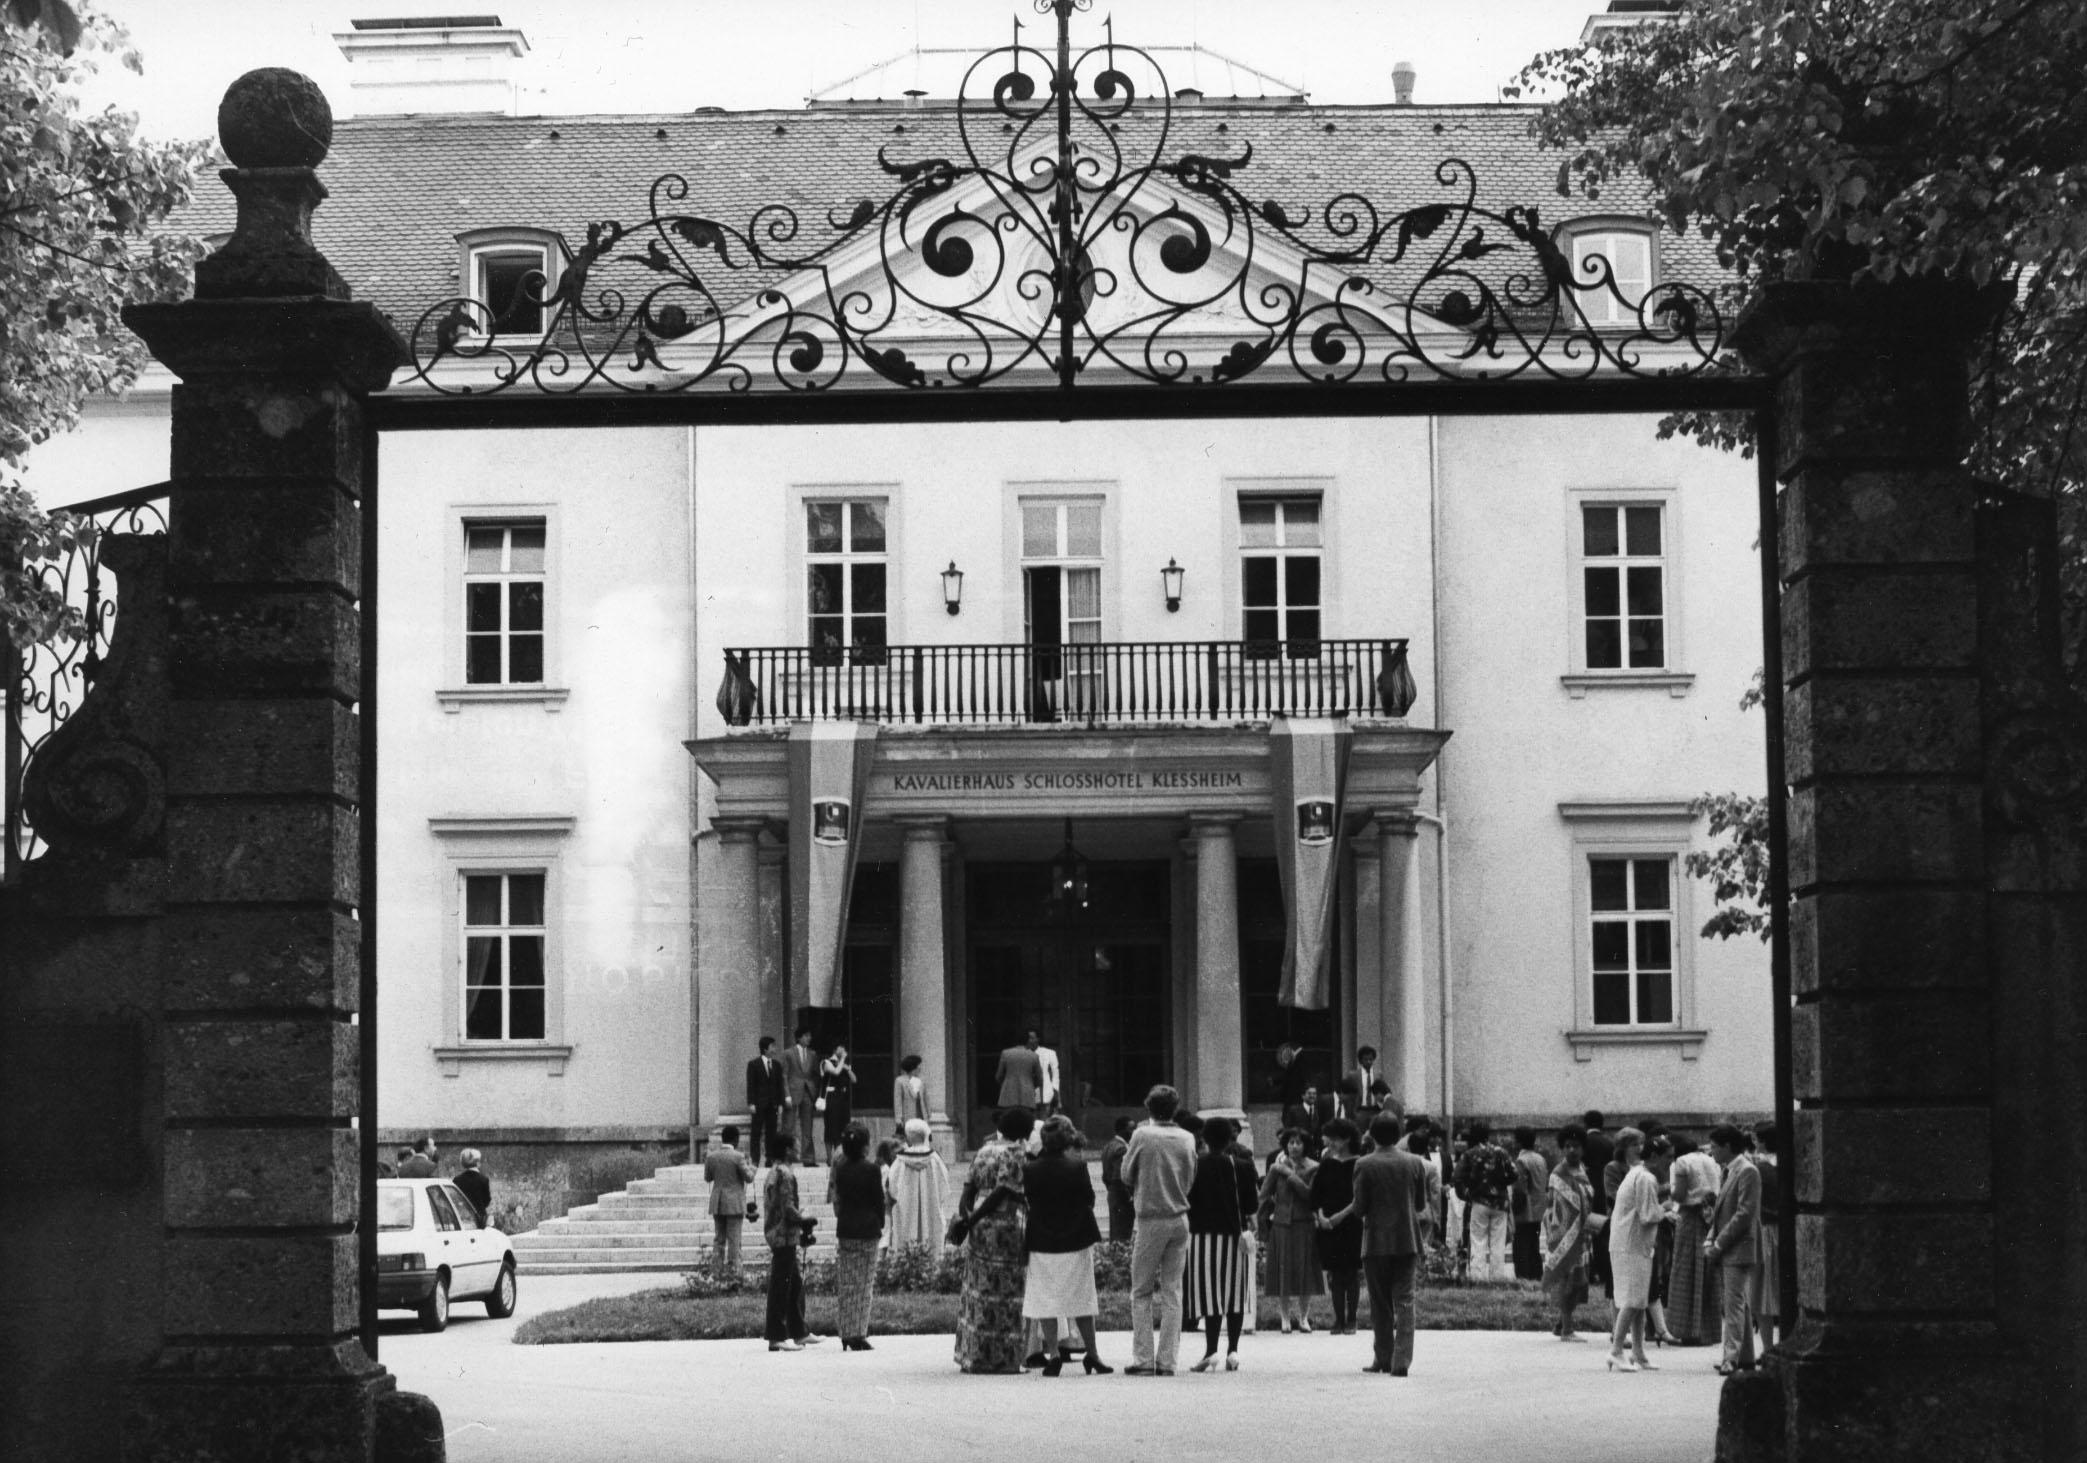 History - TS-Salzburg - Tourismusschulen Salzburg